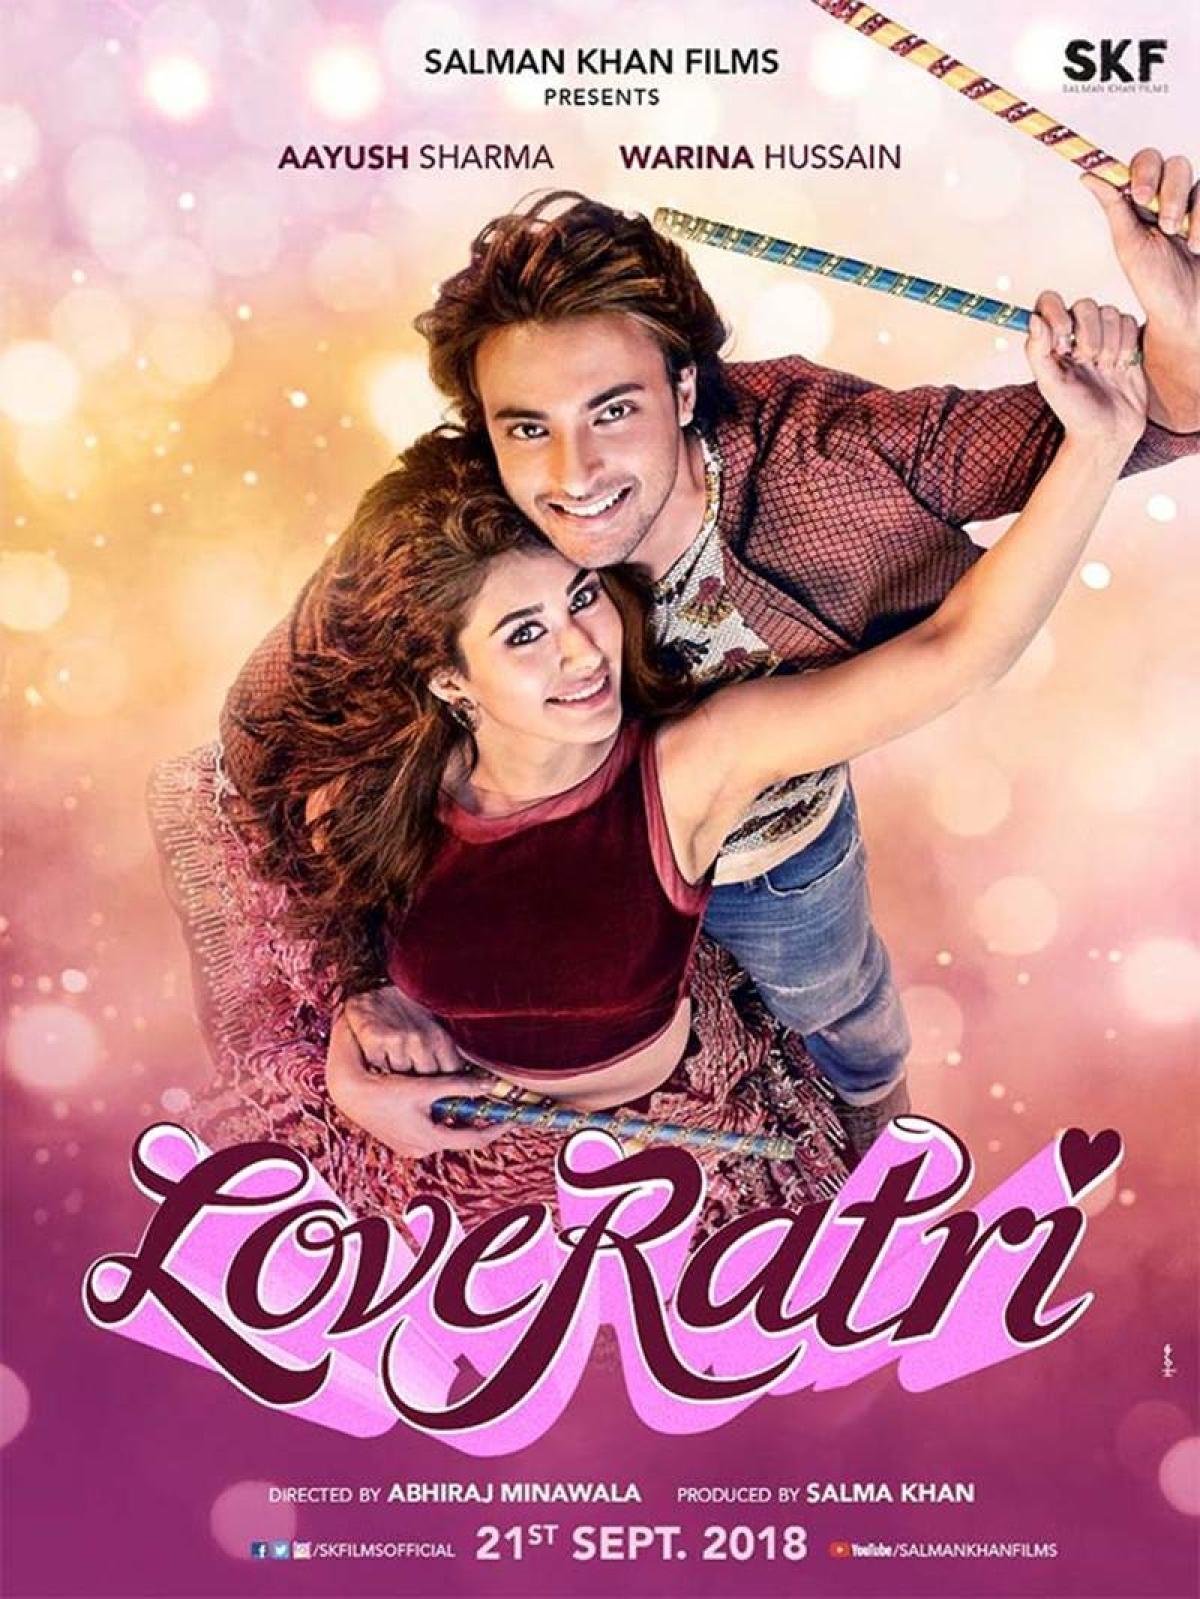 'Loveratri' teaser will have Salman Khan's voice-over